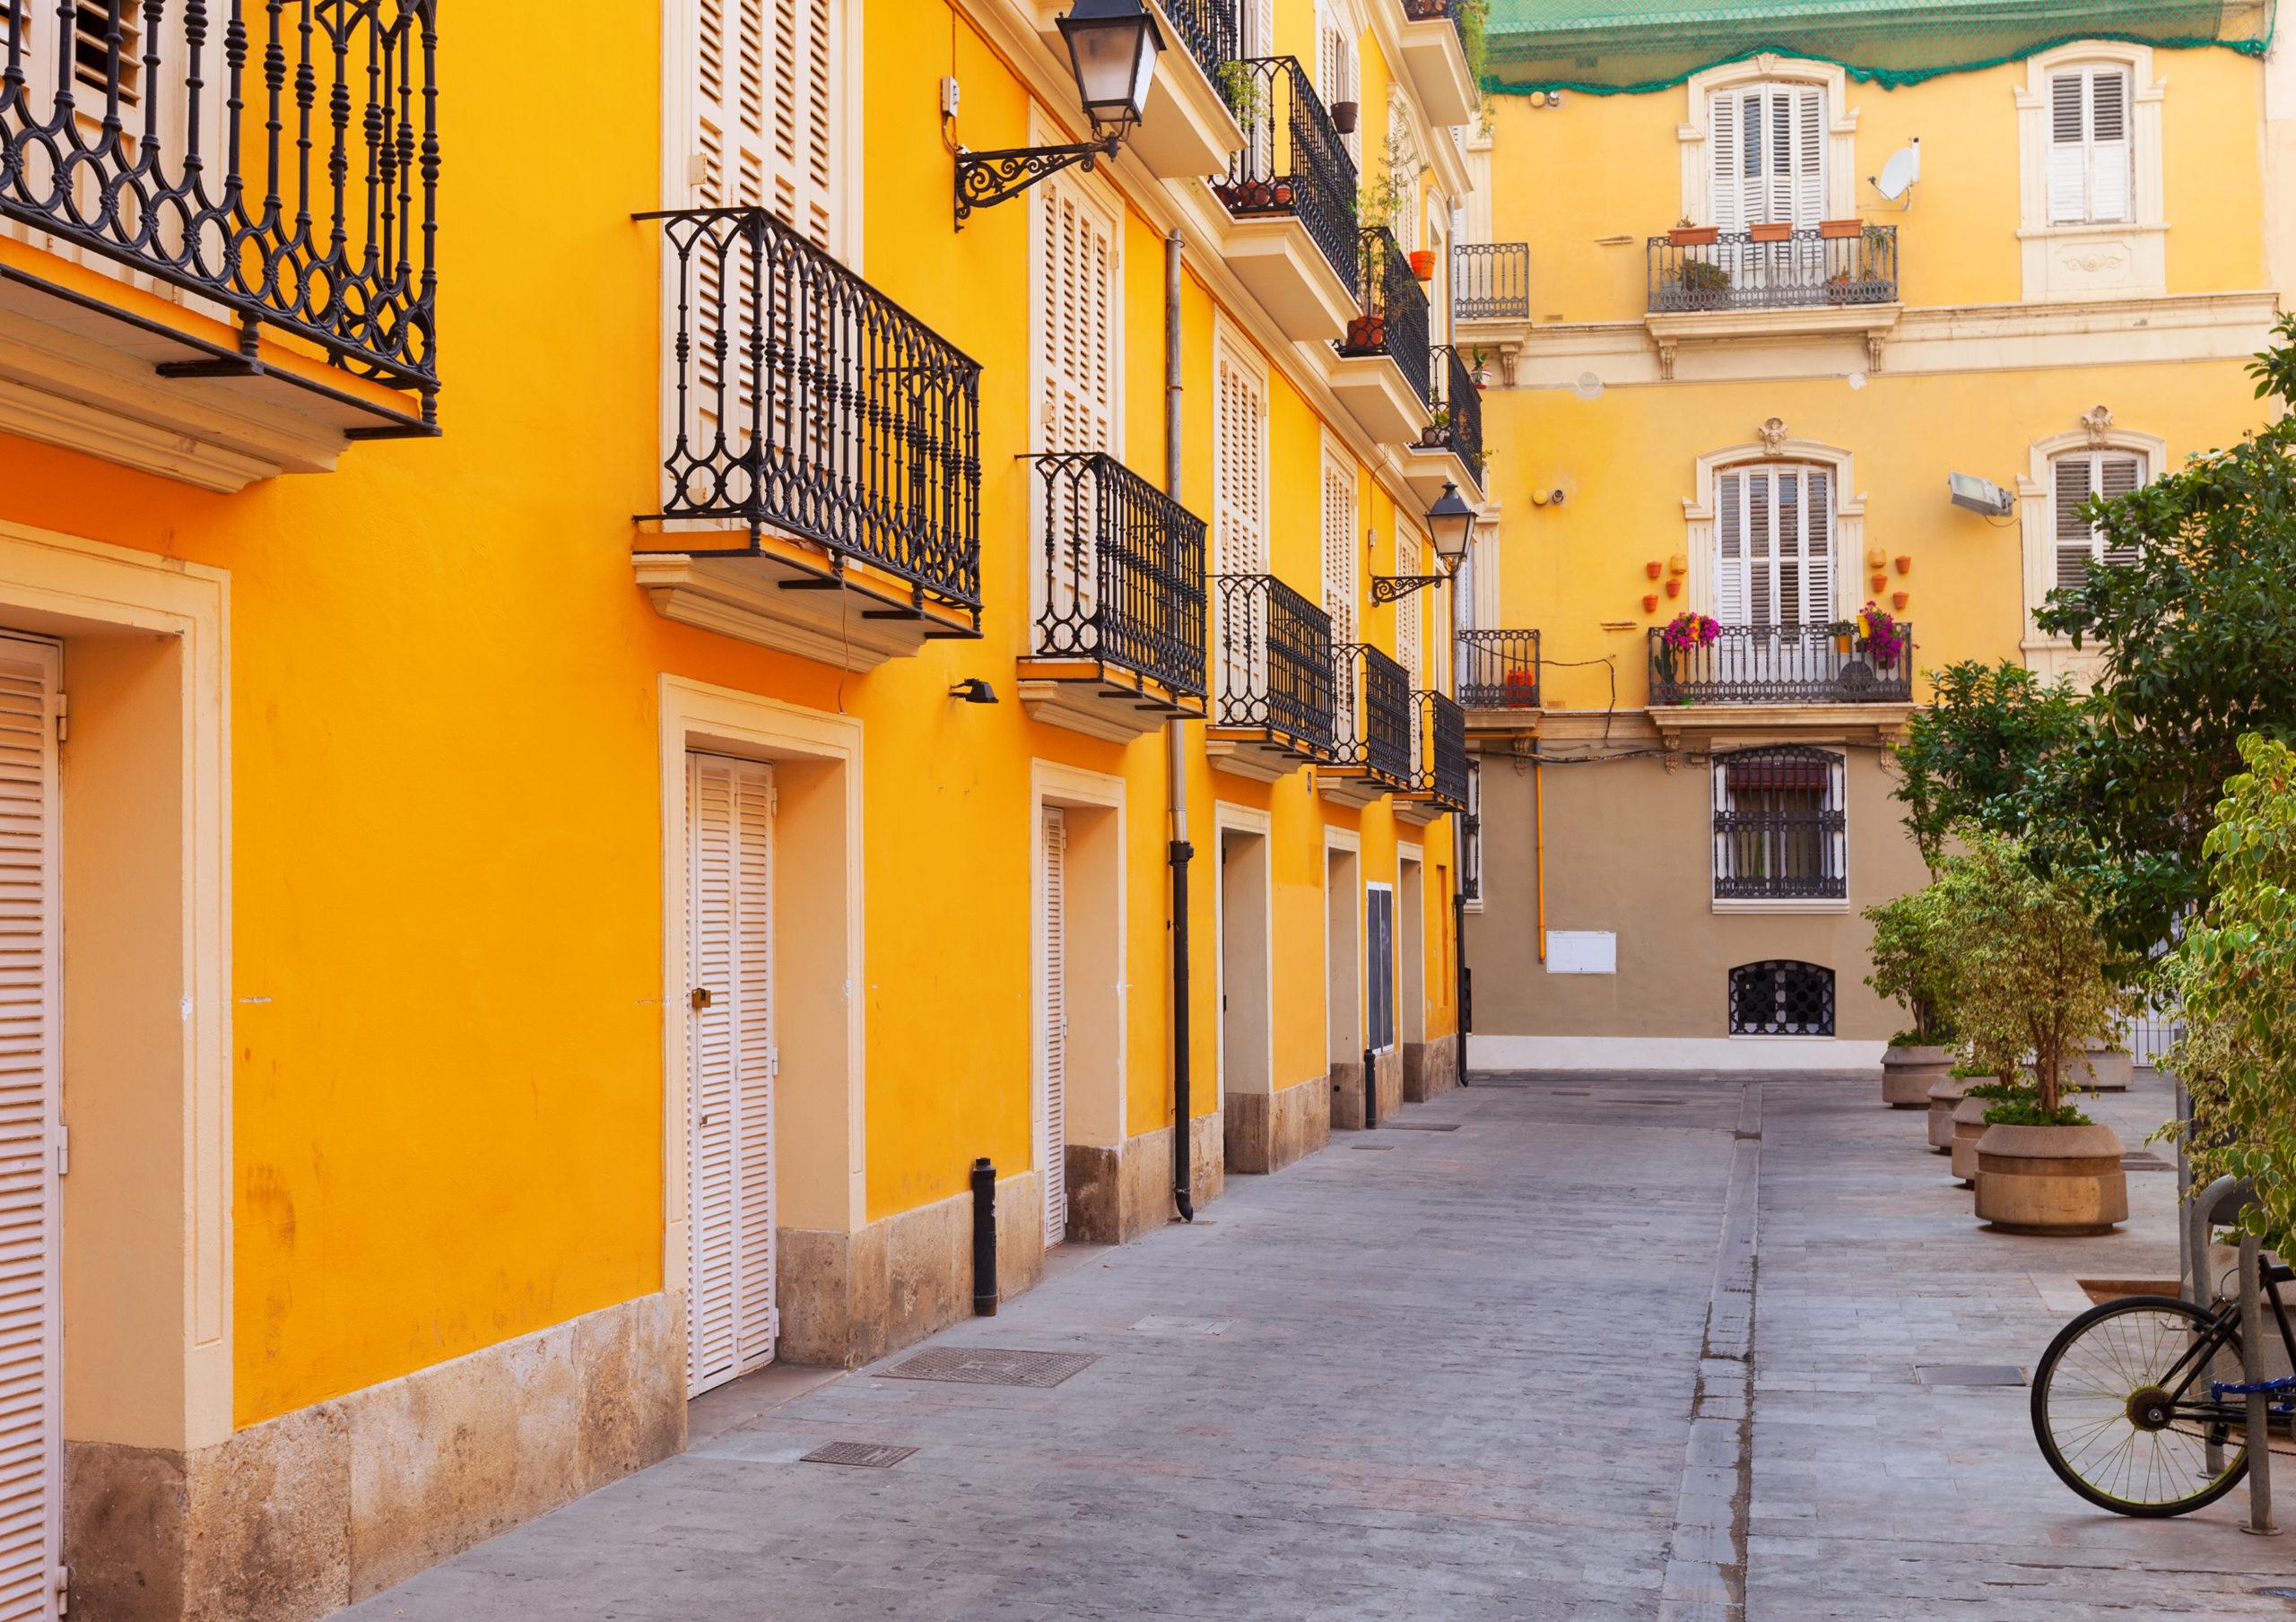 courtyard in spanish city. Valencia